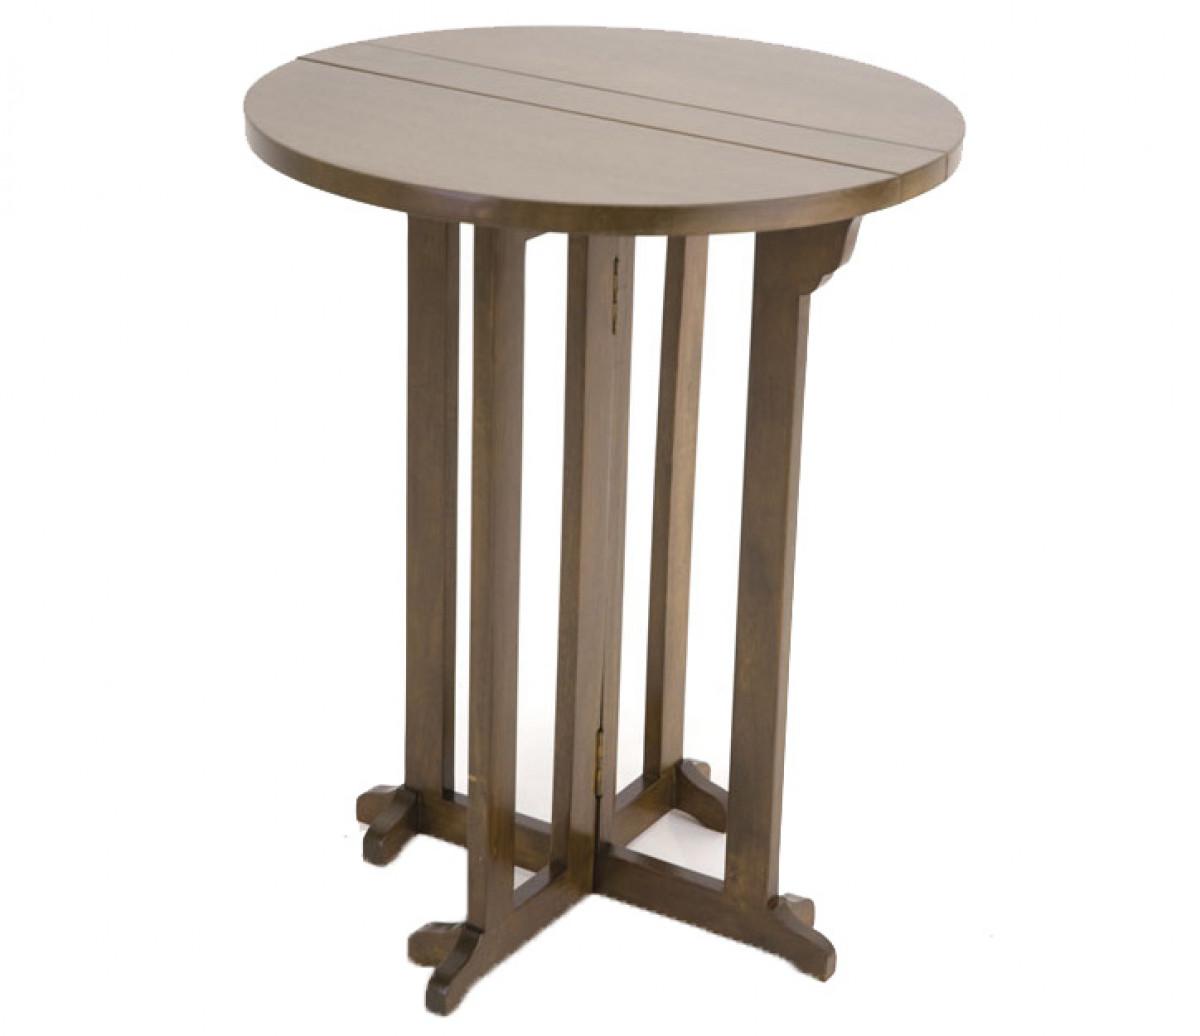 table ronde a rabat diametre 60 cm